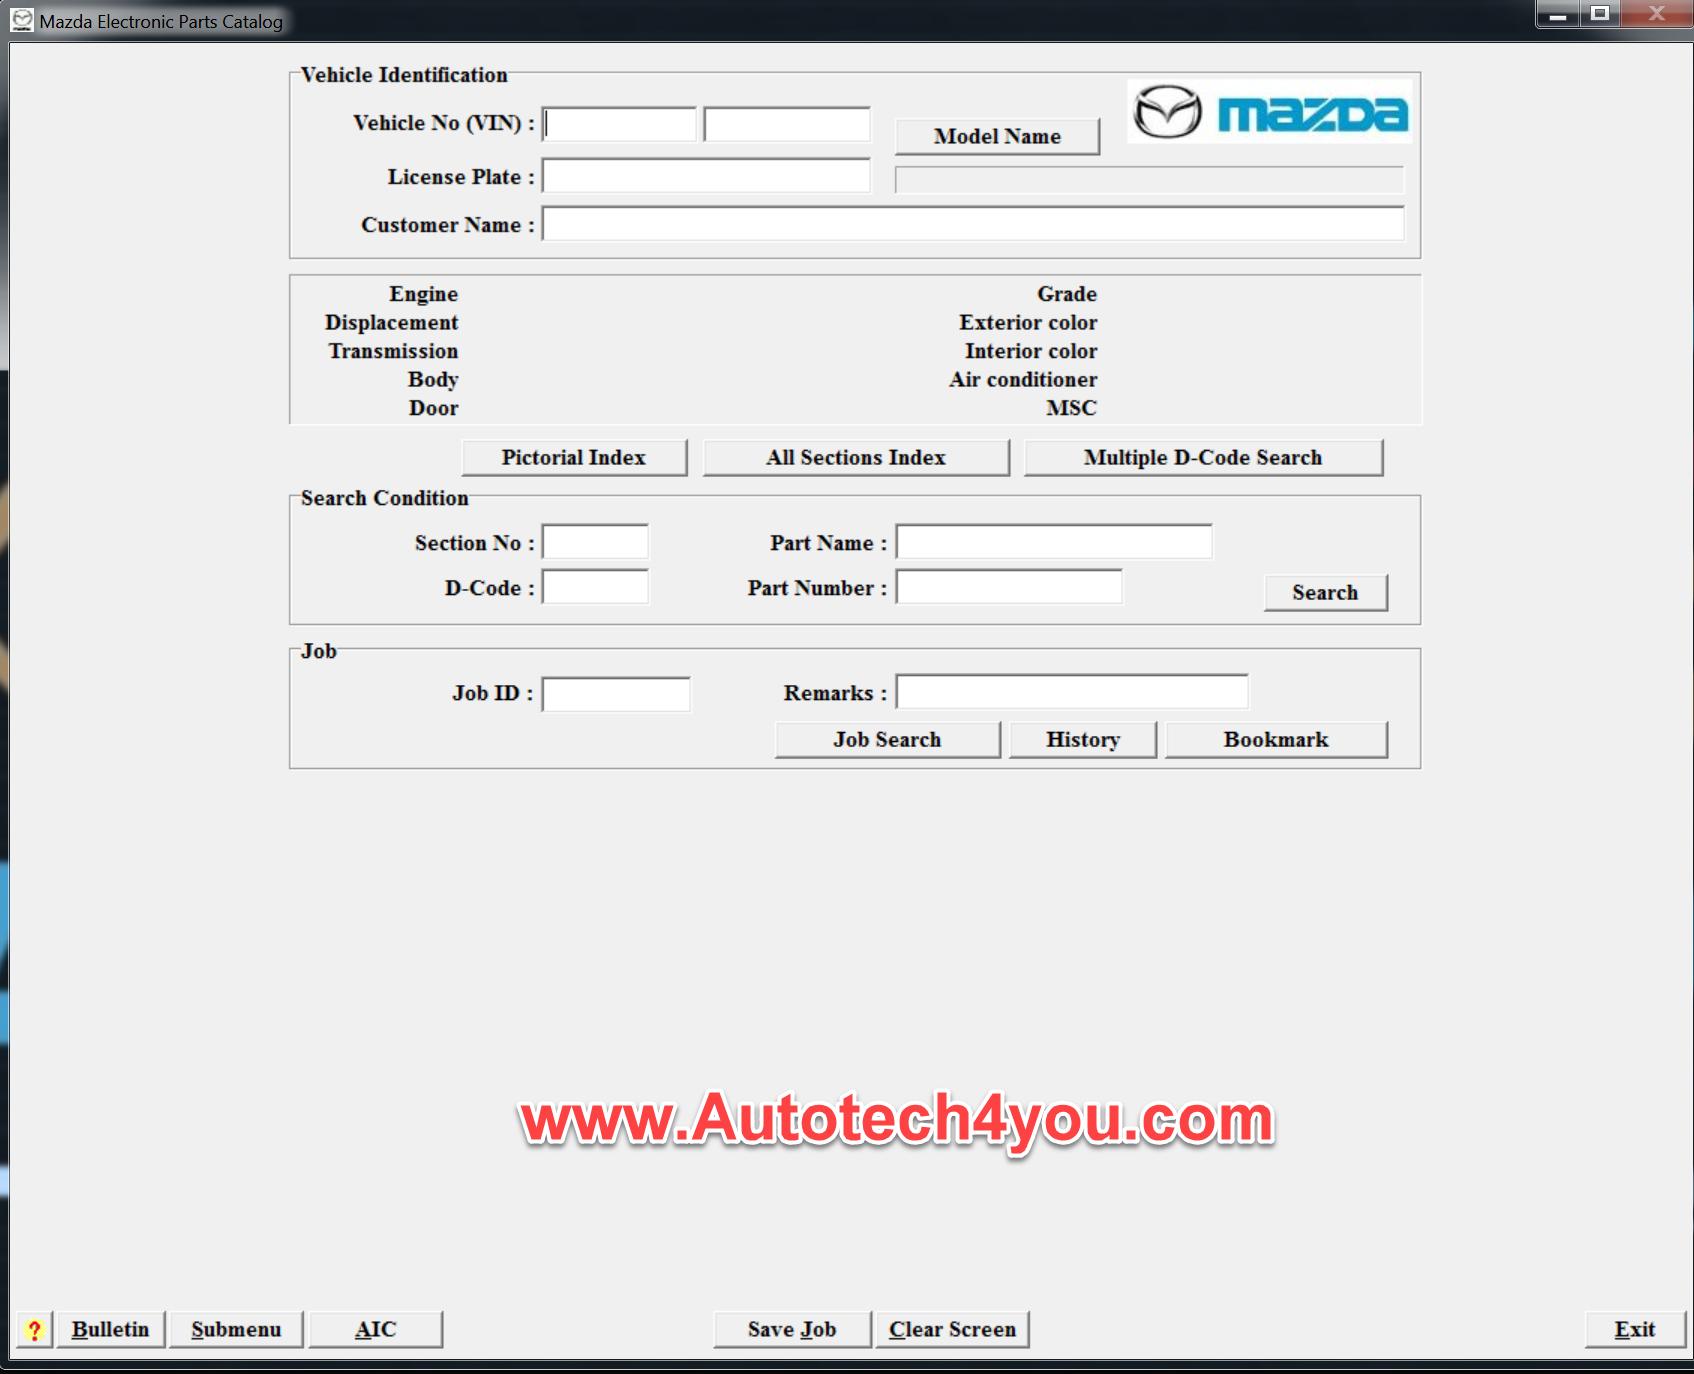 Mazda parts catalog